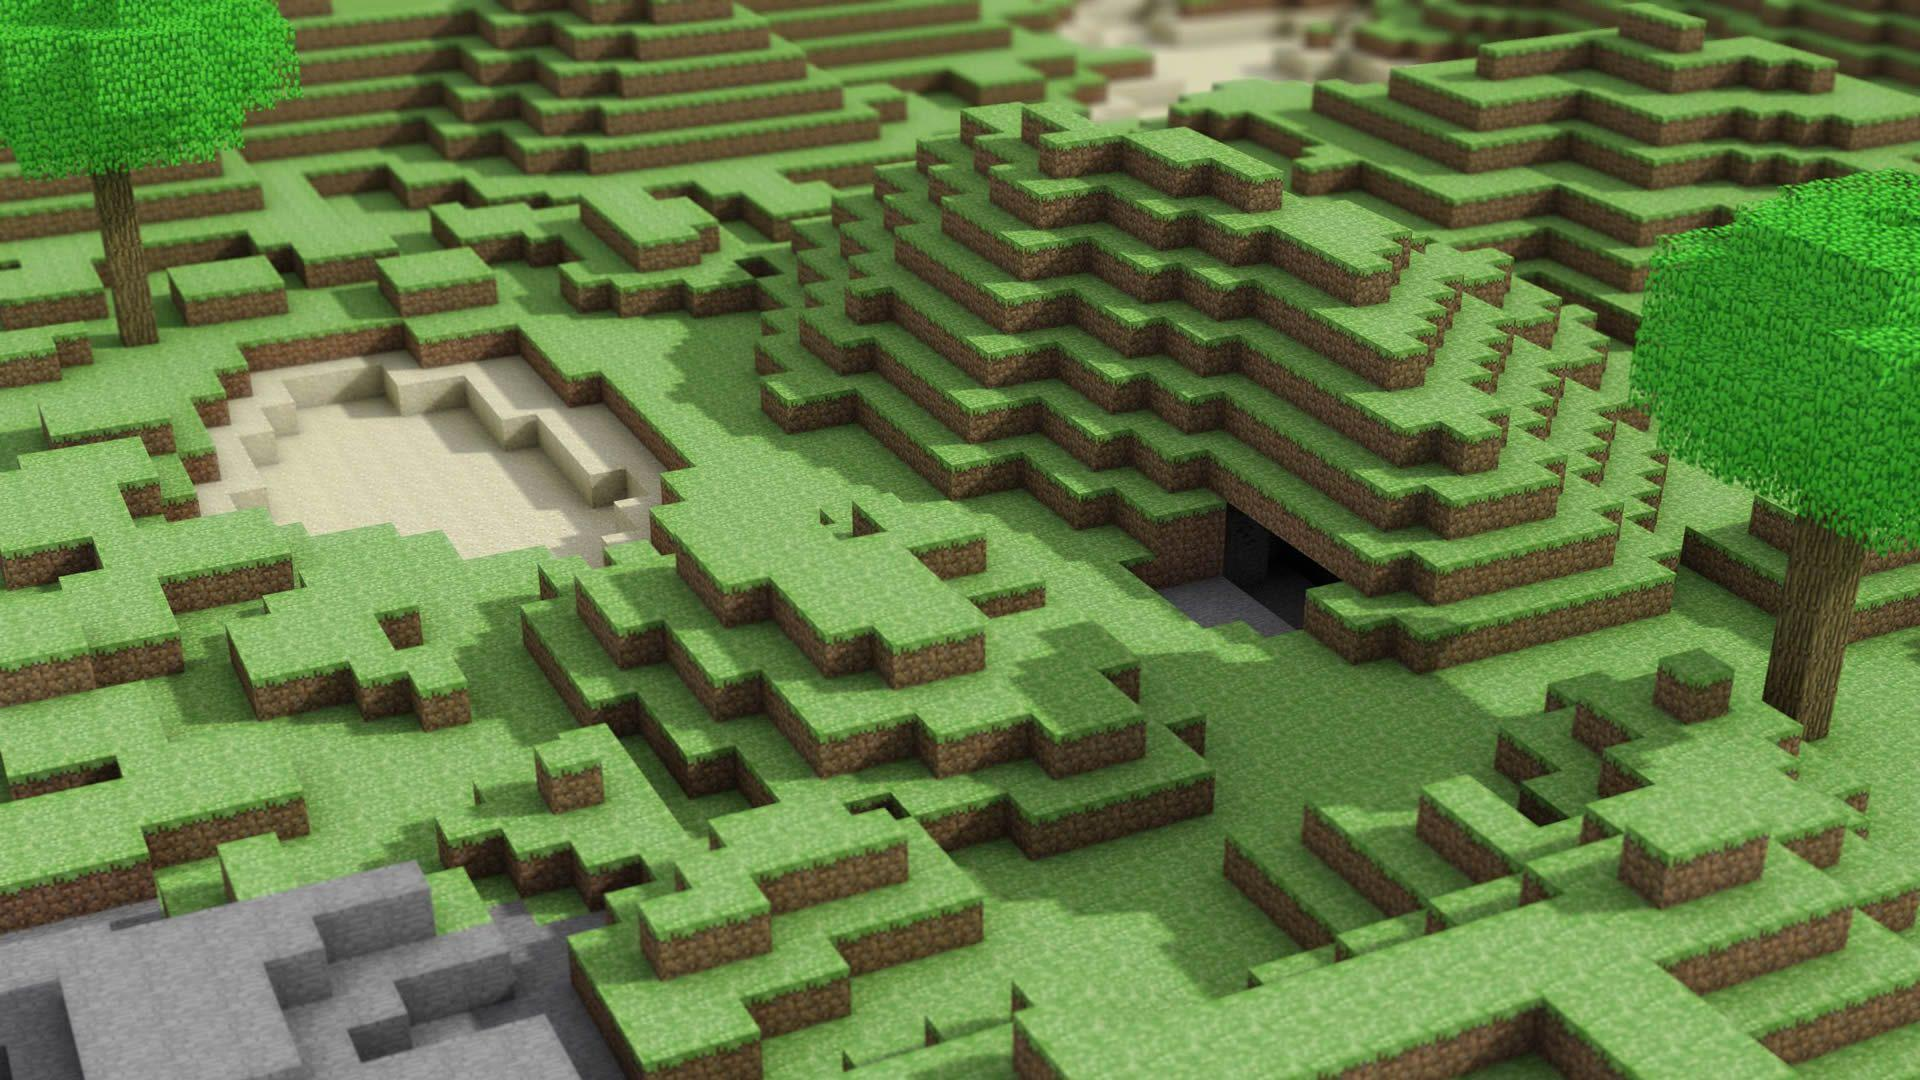 Minecraft Wallpapers 1920x1080 Wallpaper Cave